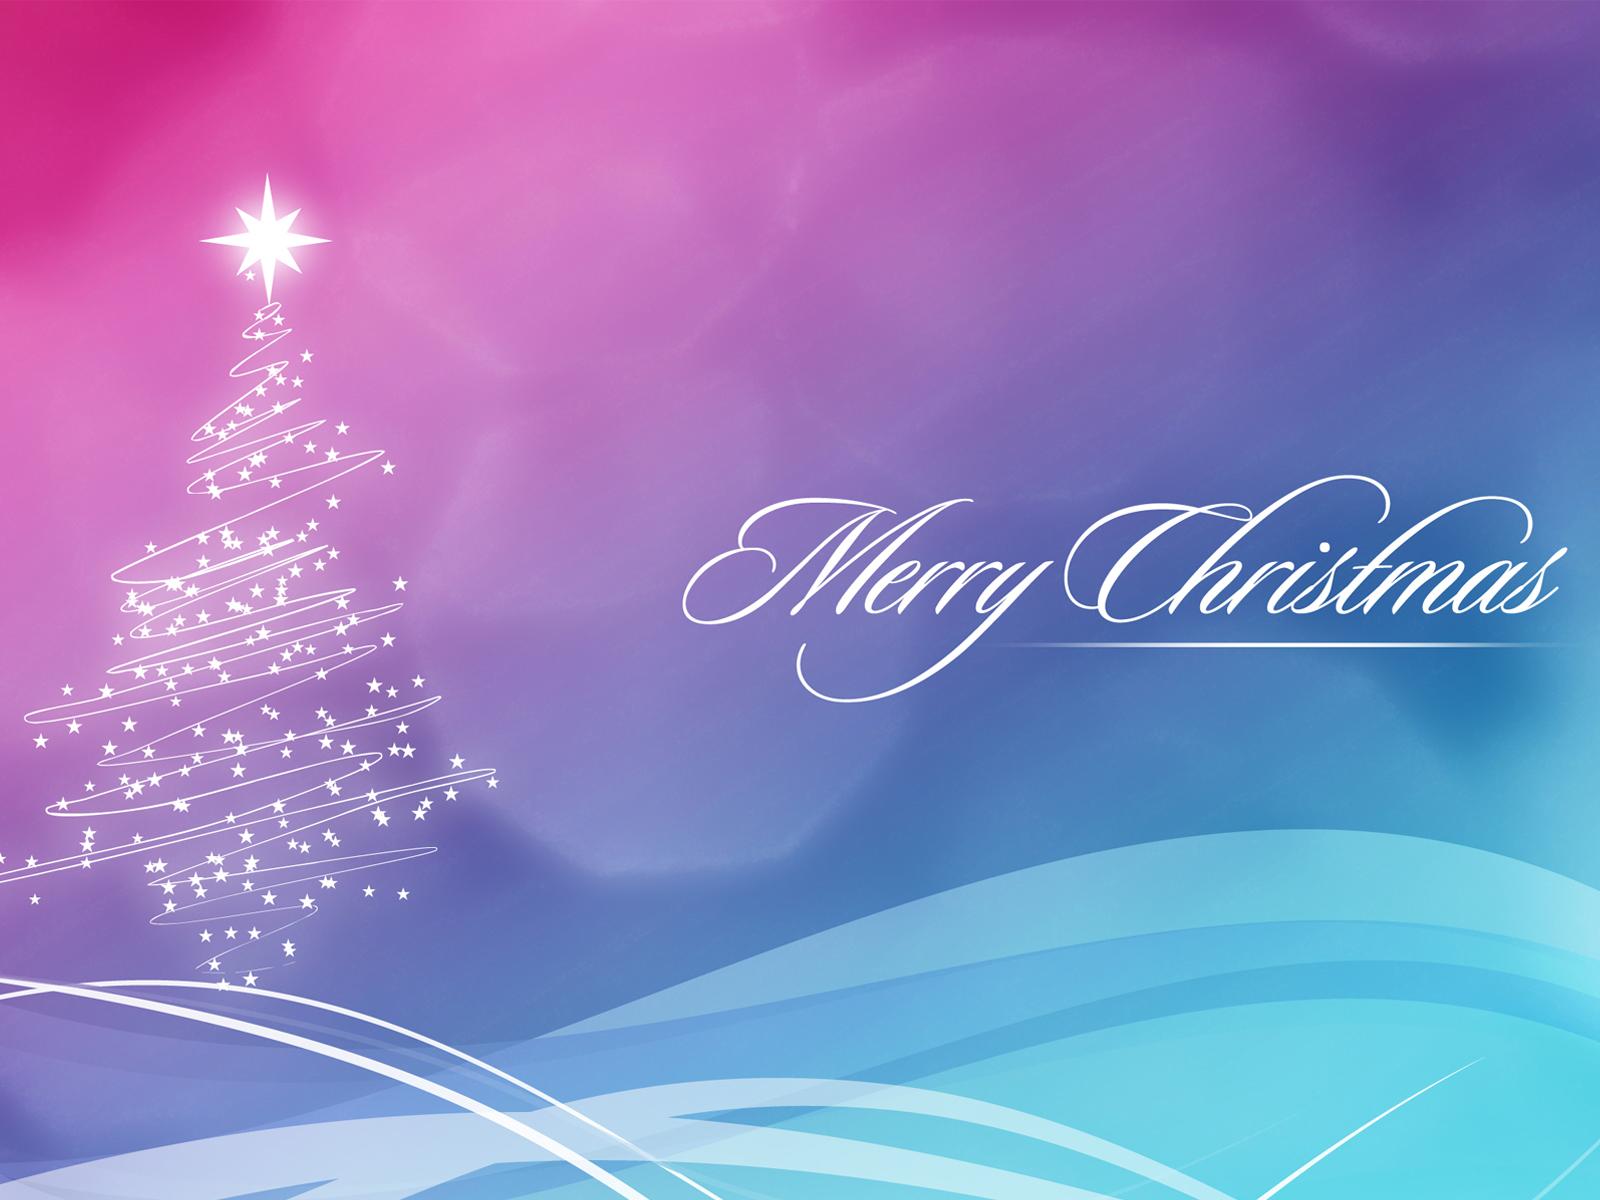 Frasi Di Natale Gianni Rodari.Frasi Di Auguri Buon Natale Attimi Aforismi E Frasi Celebri Page 4